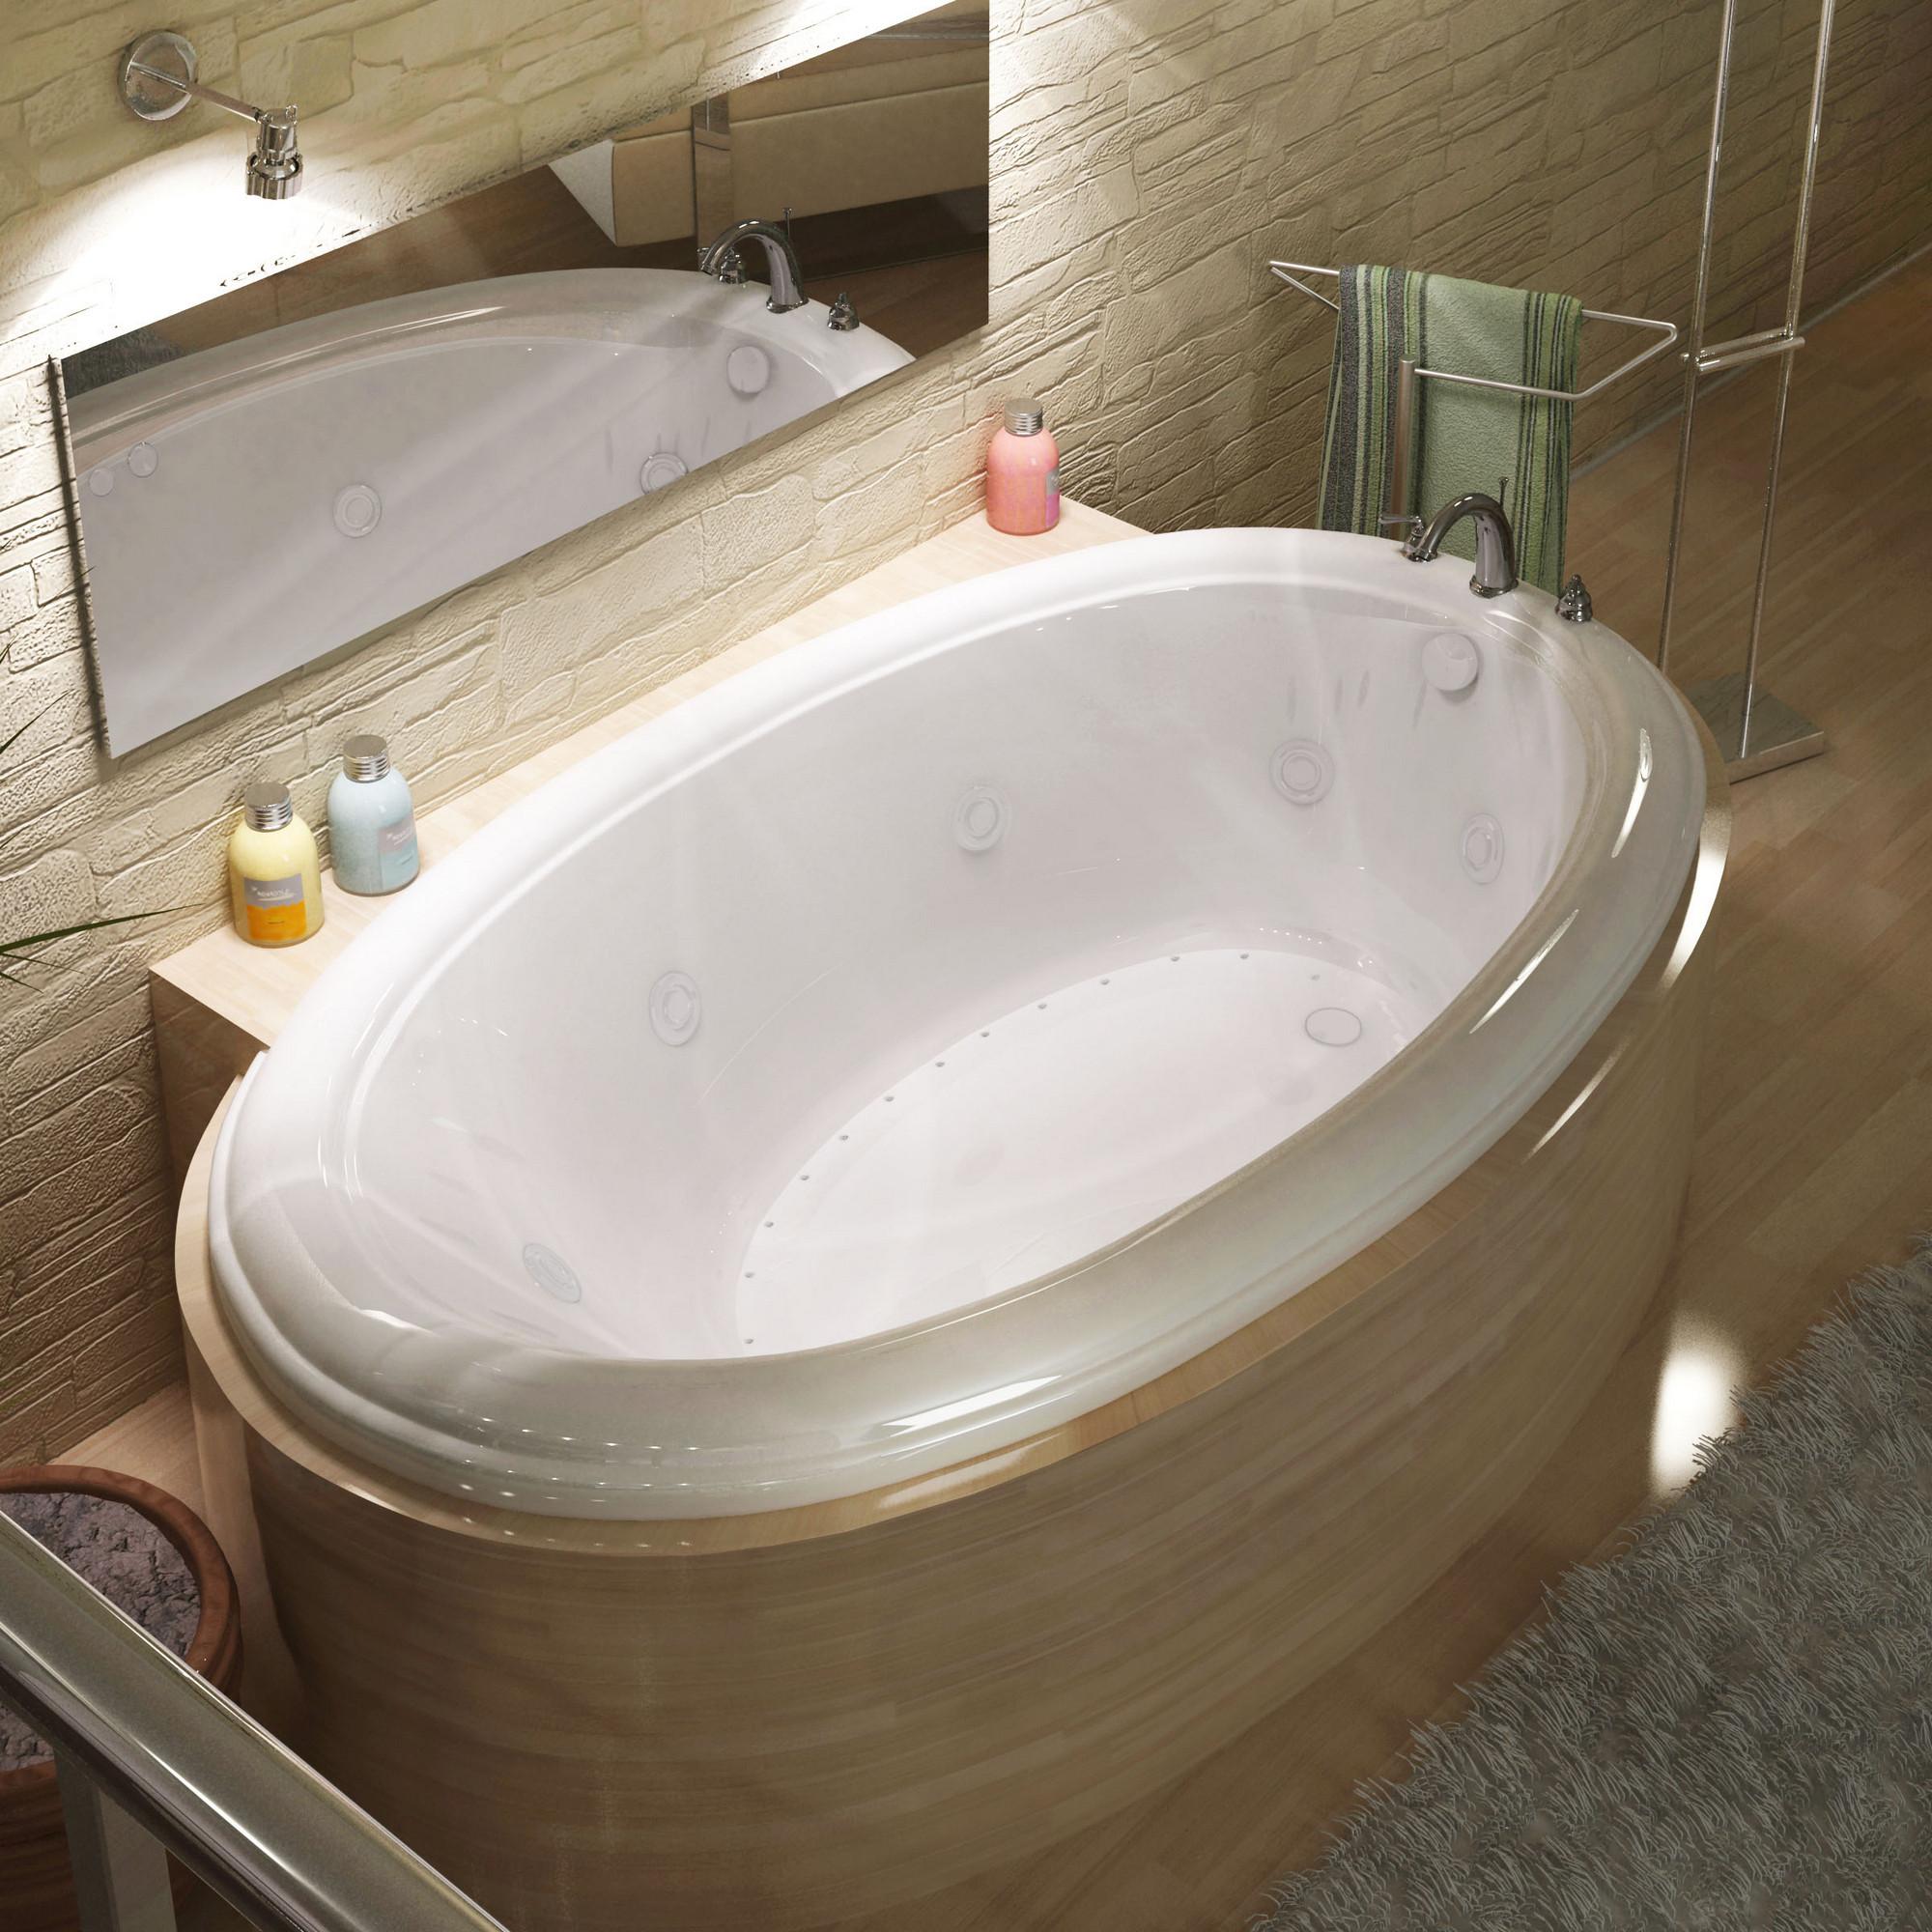 MediTub 3660PDL Atlantis Petite Oval Air & Whirlpool Tub With Left Drain